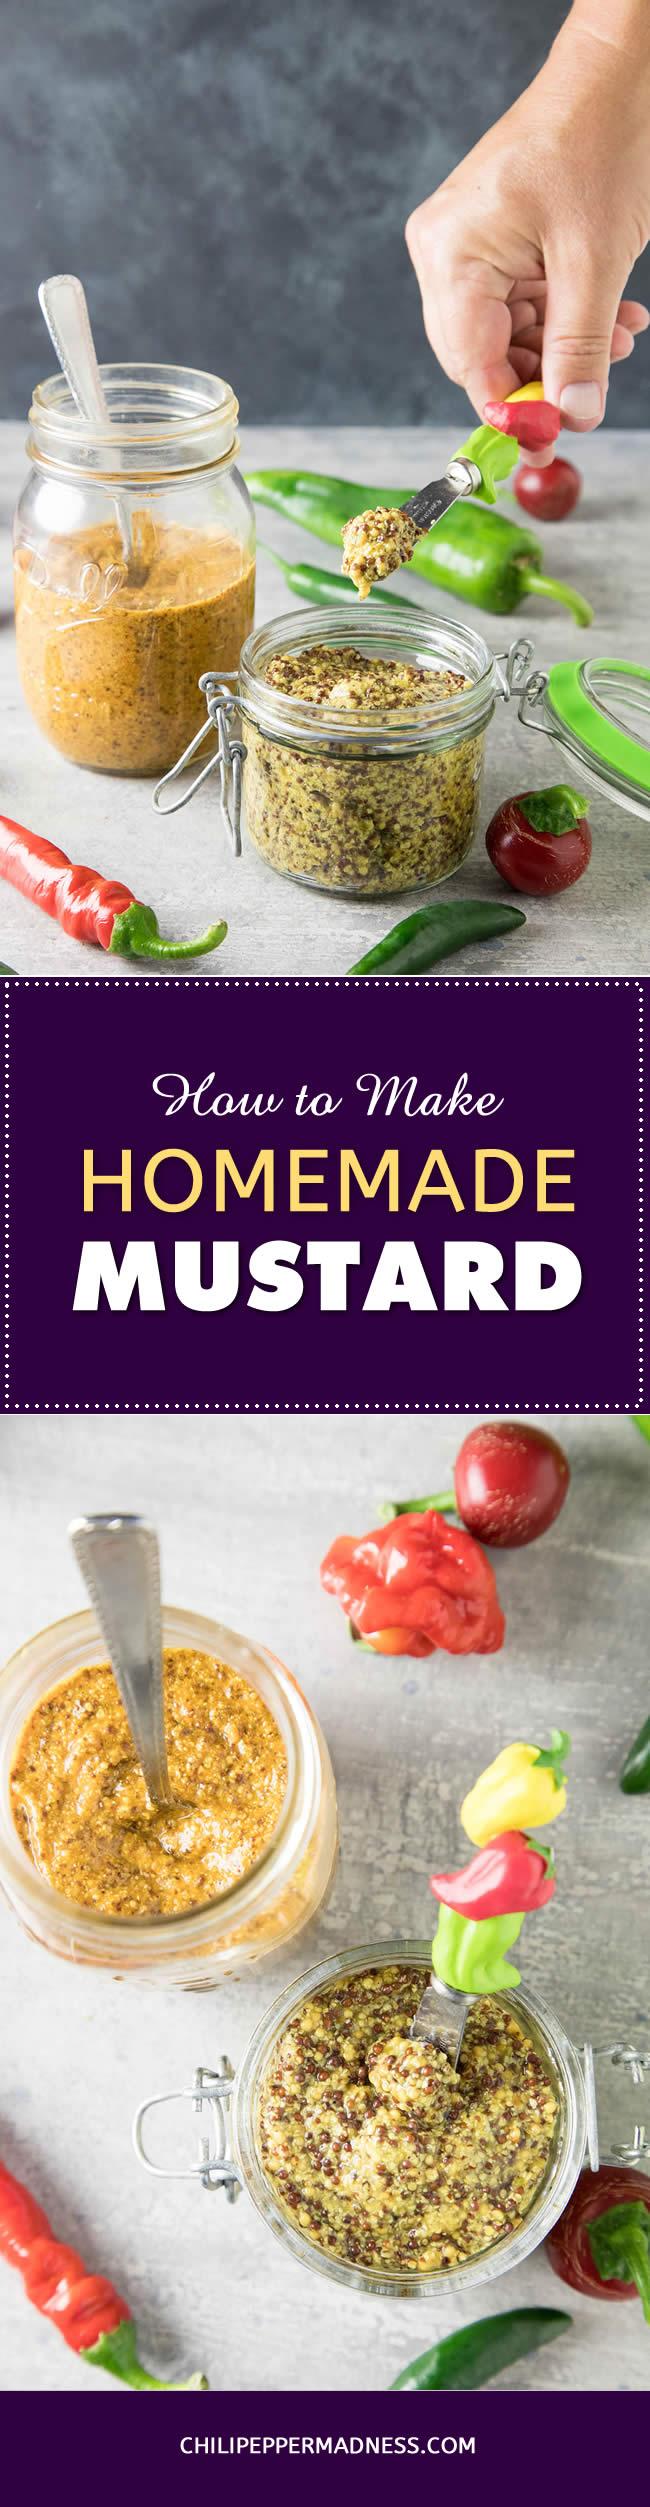 How to Make Homemade Mustard – the Basics - Recipe